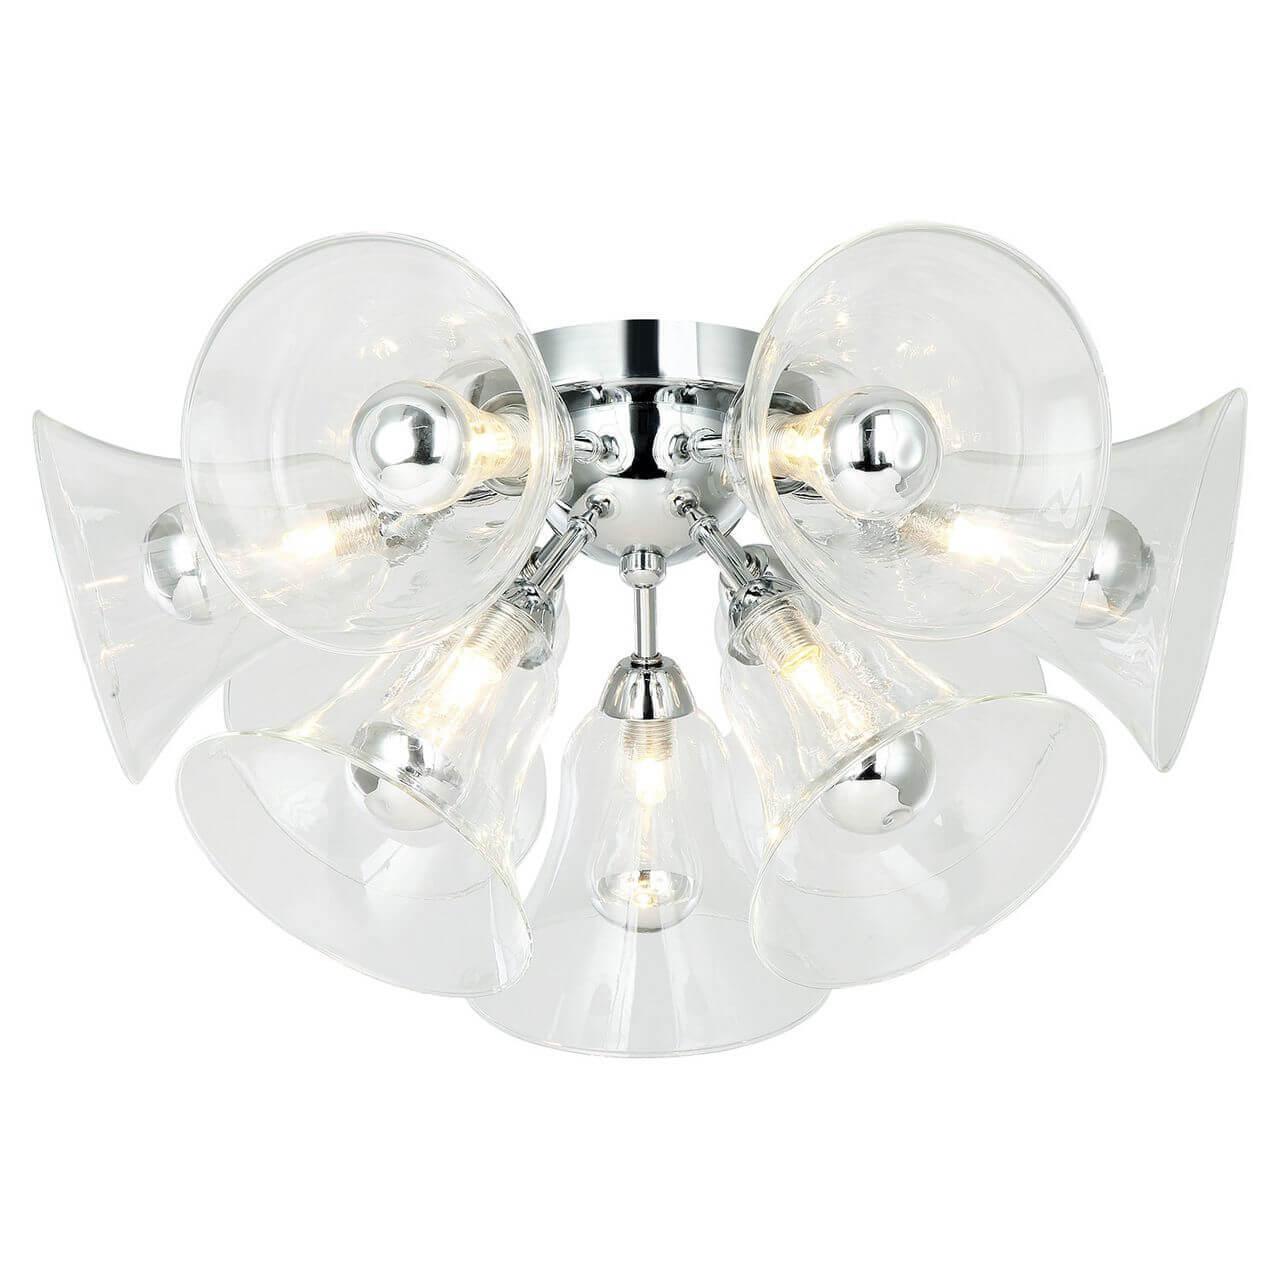 Потолочная люстра Lussole Loft Oneida GRLSP-8196 цены